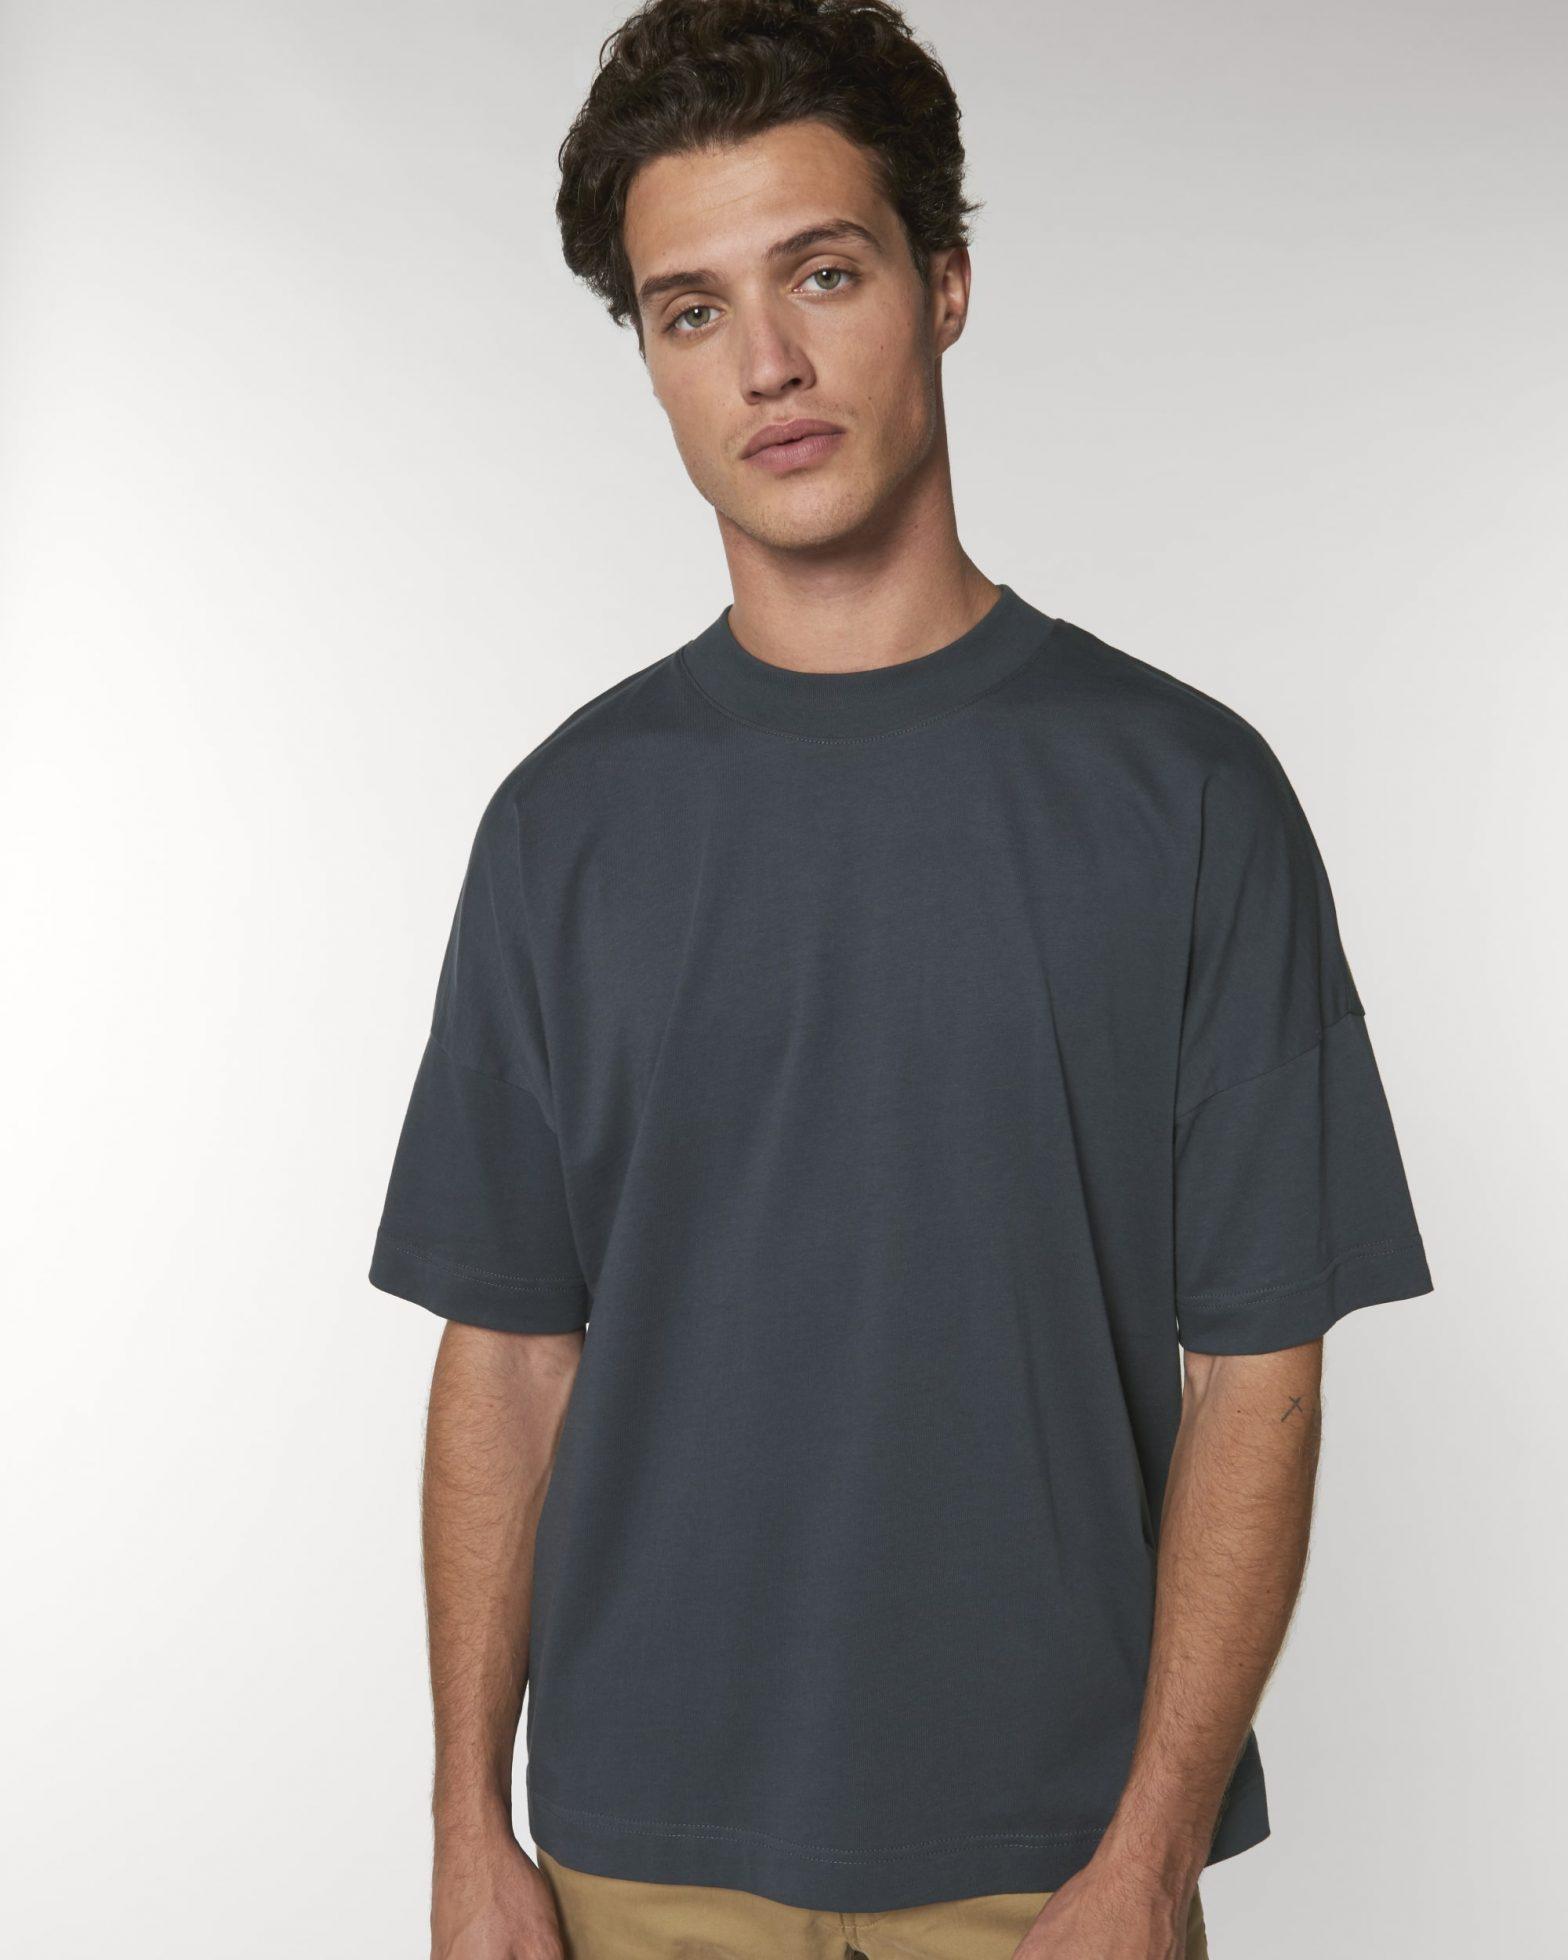 Organic T-shirt Ink Grey